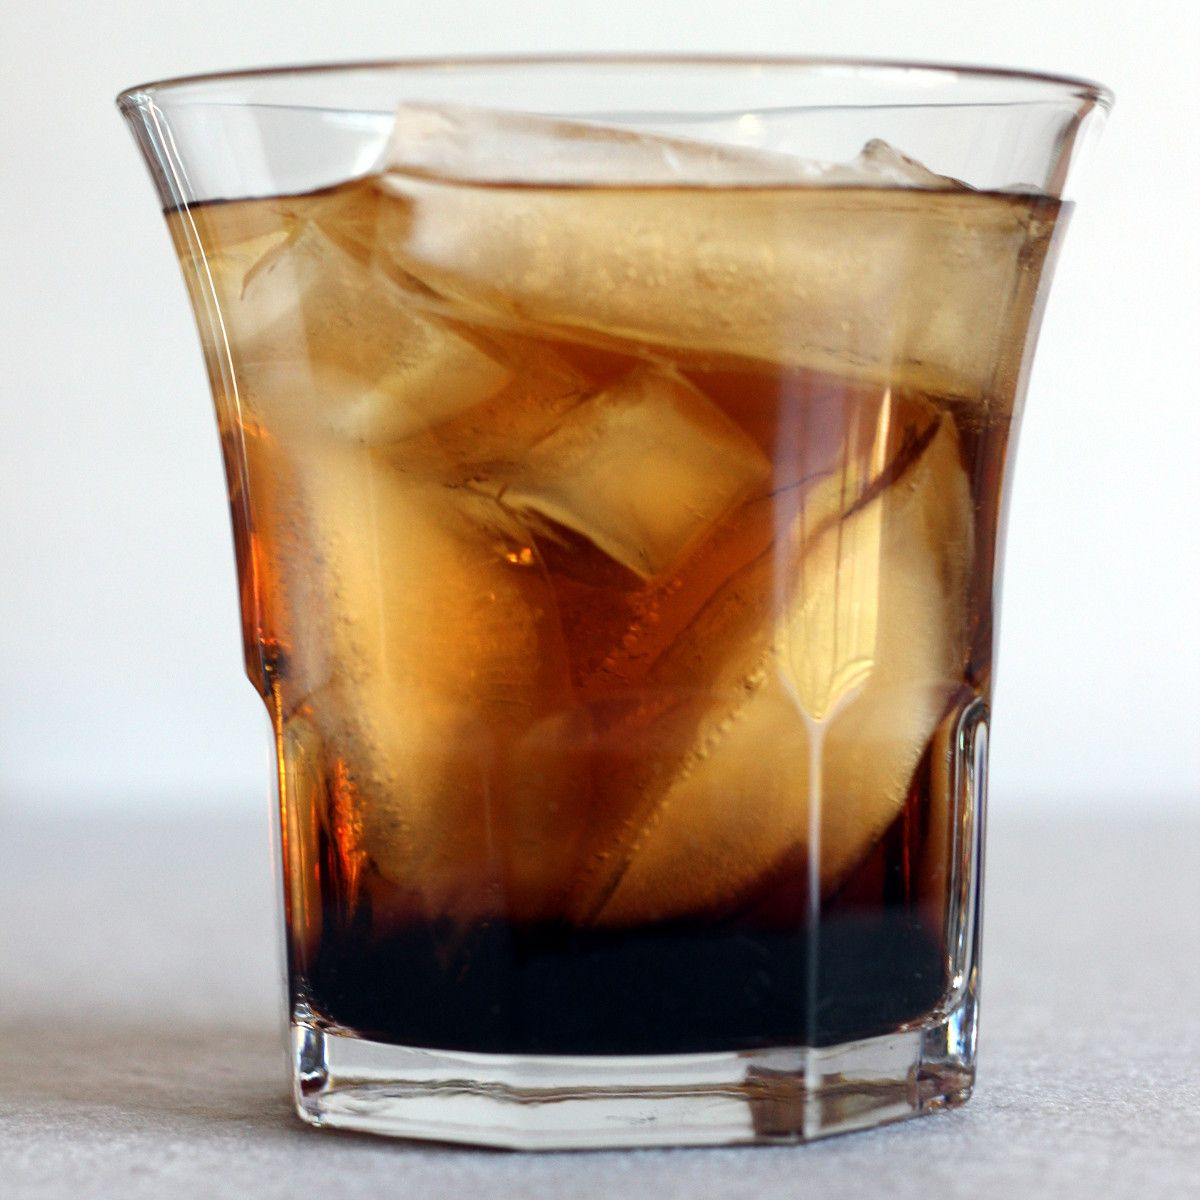 Black Russian Mix That Drink Kahlua Drinks Black Russian Black Russian Drink